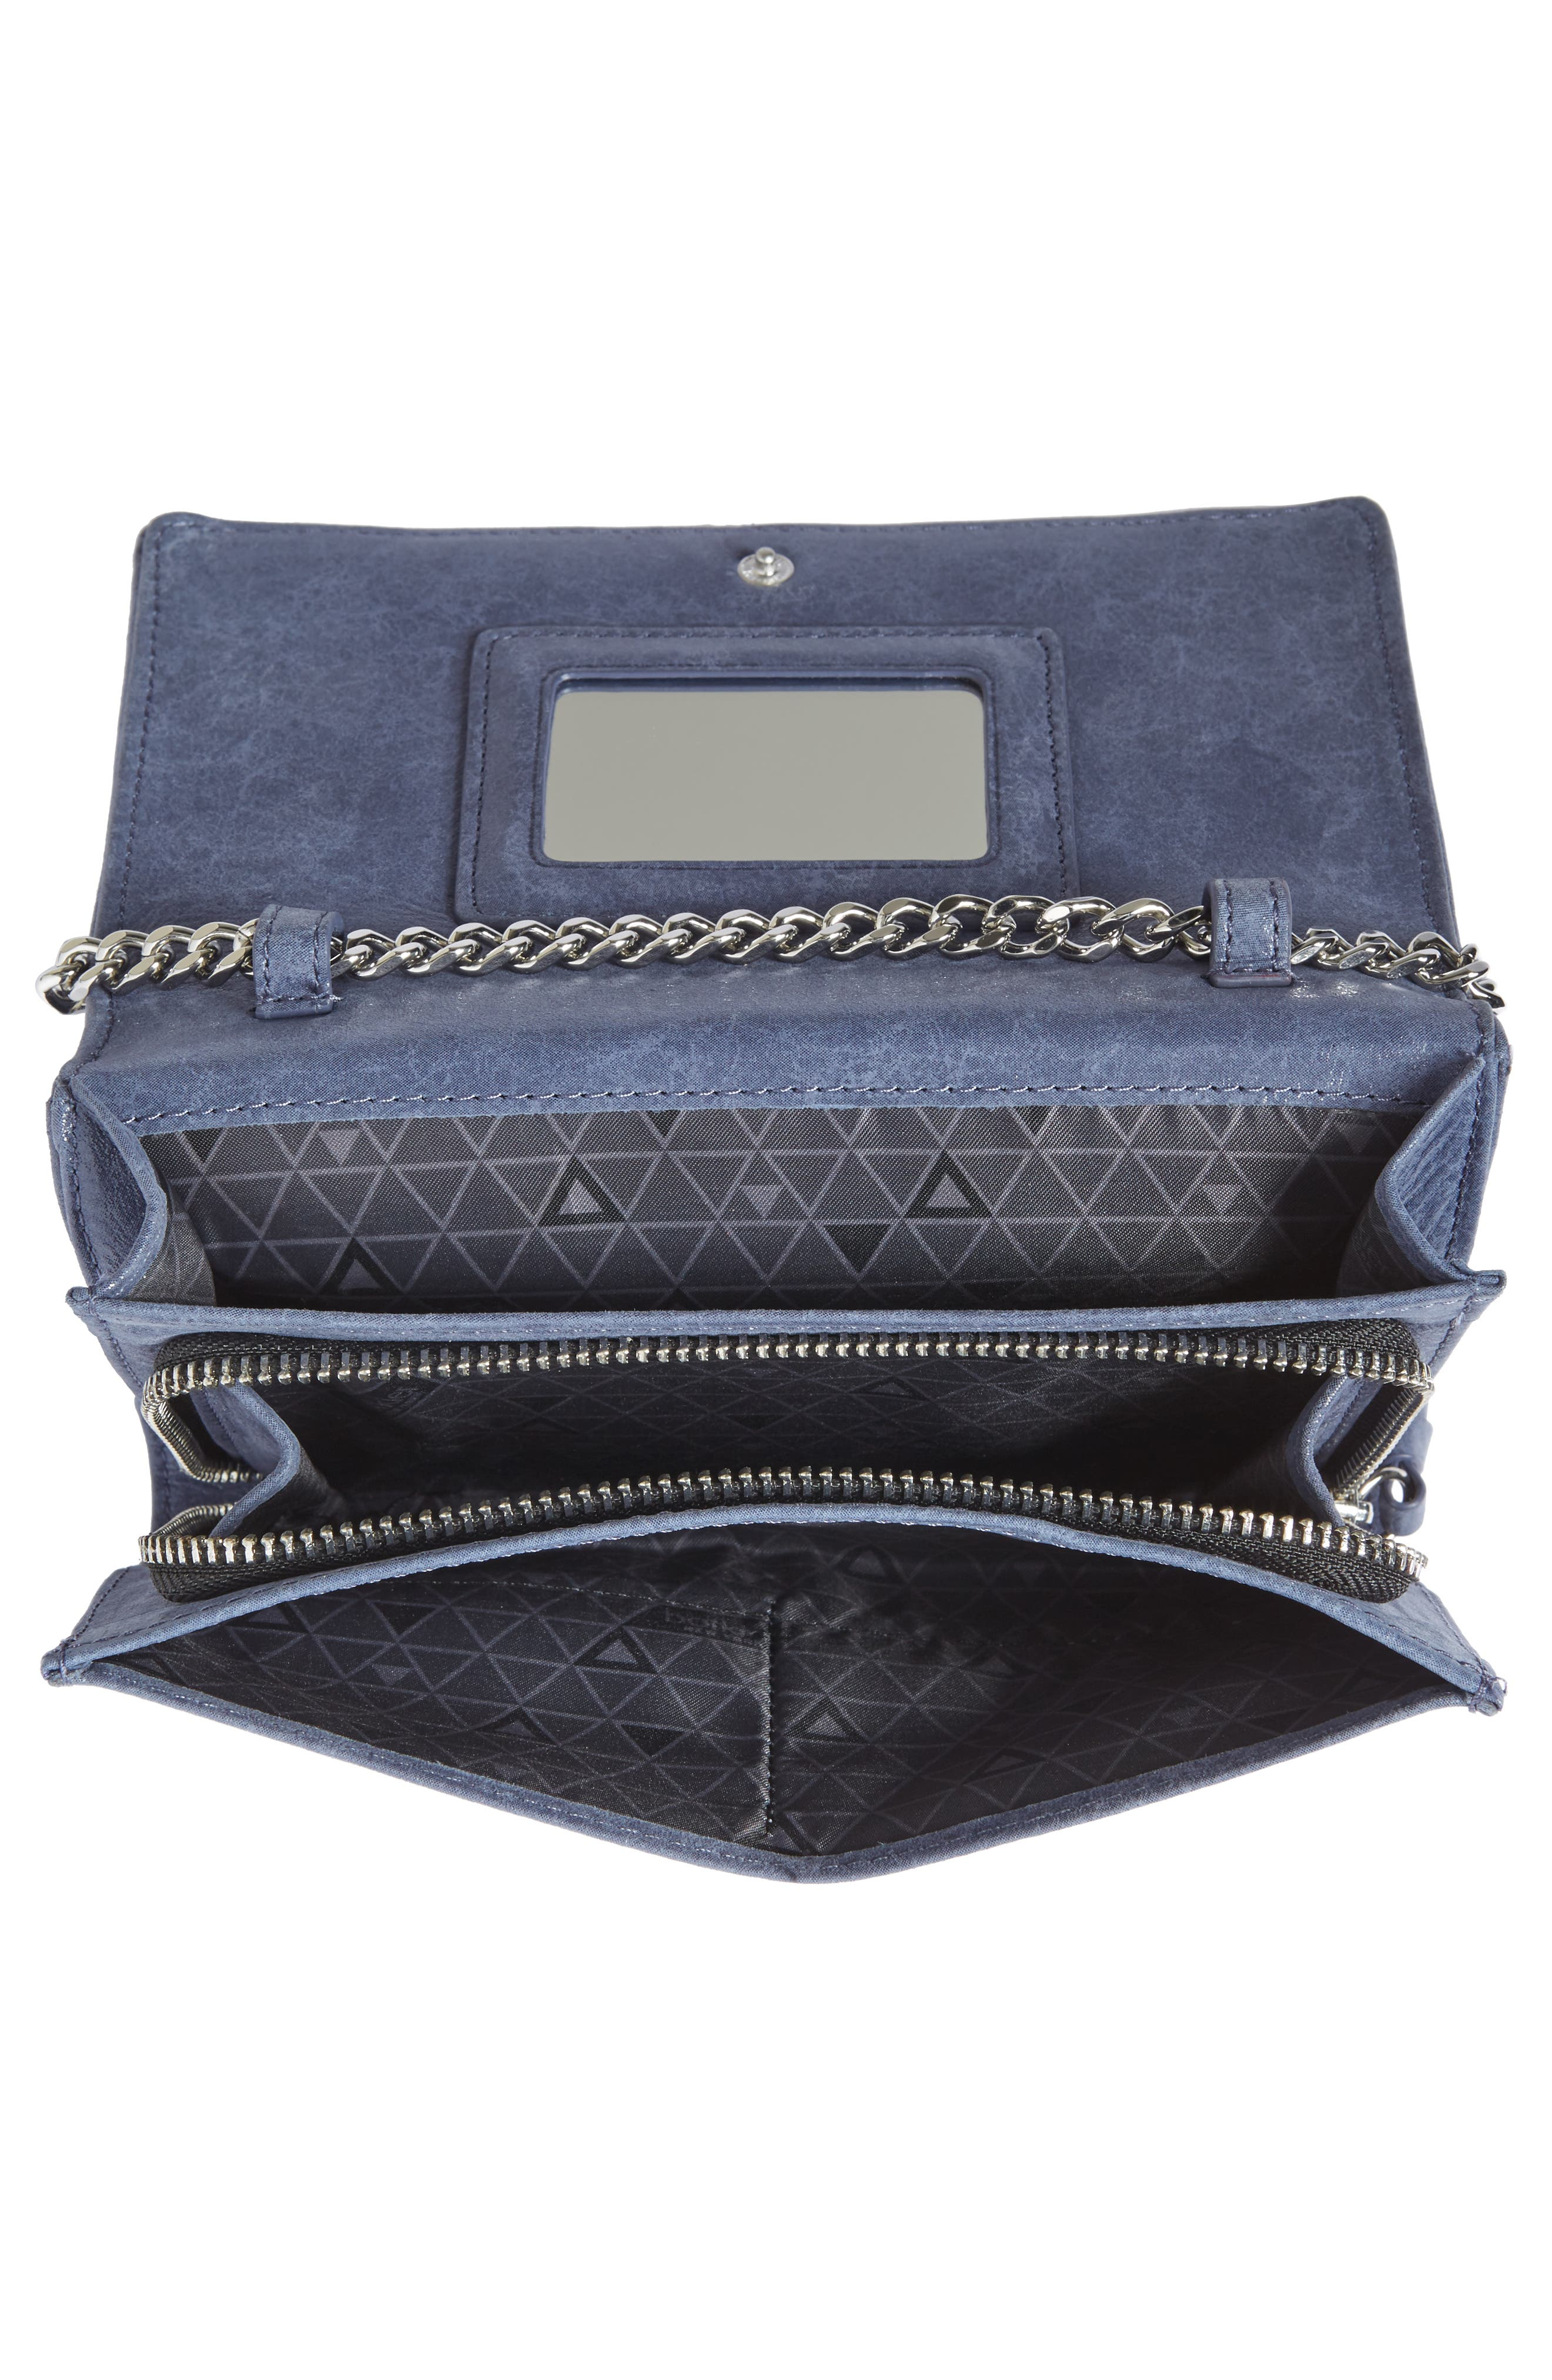 Logan Leather Crossbody Wallet,                             Alternate thumbnail 15, color,